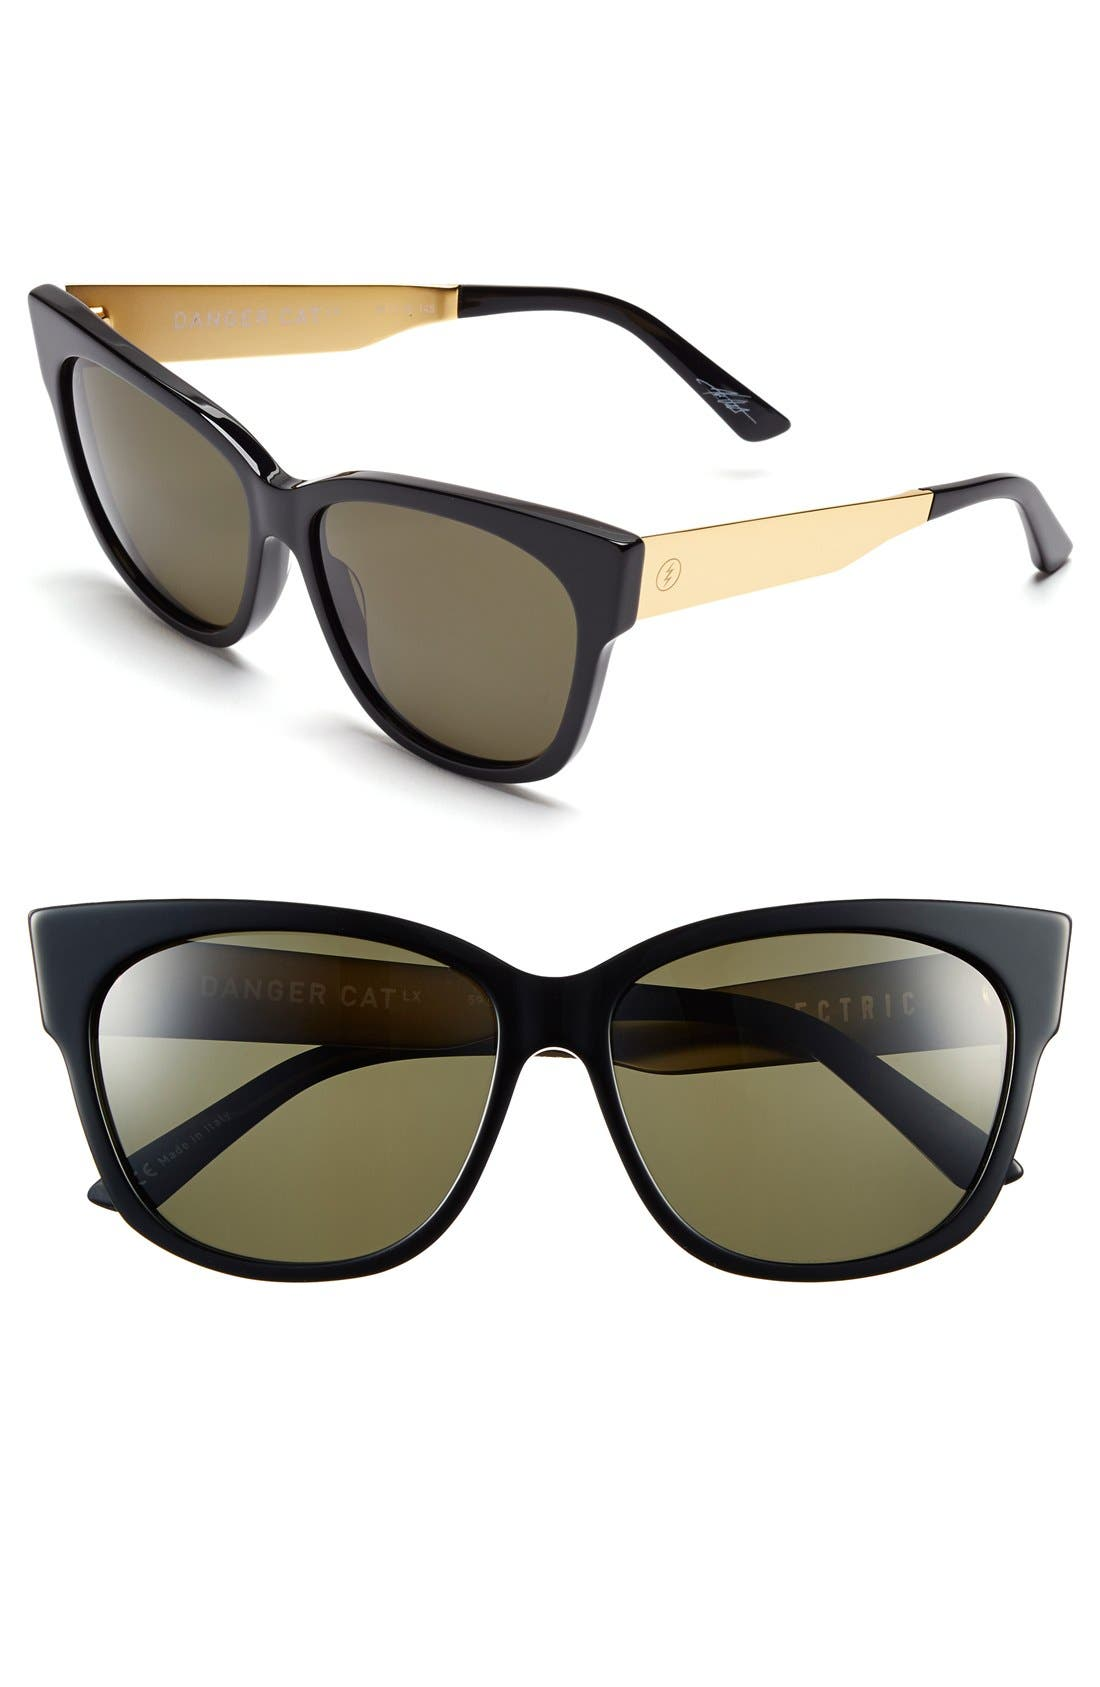 Main Image - ELECTRIC 'Danger Cat LX' 59mm Cat Eye Sunglasses